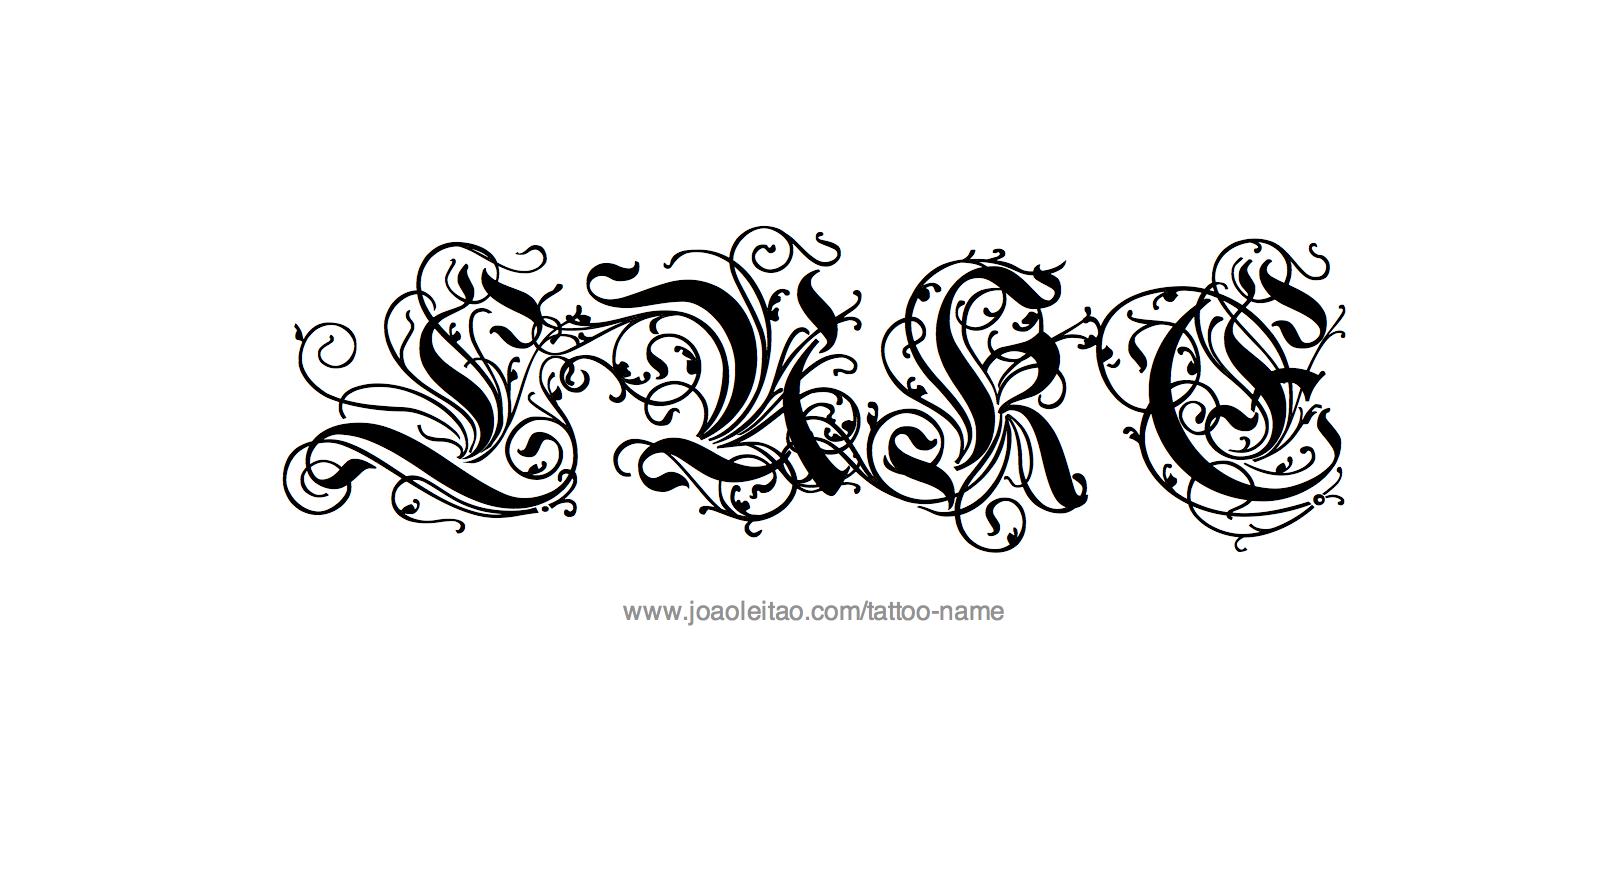 top yourself luke images for pinterest tattoos. Black Bedroom Furniture Sets. Home Design Ideas